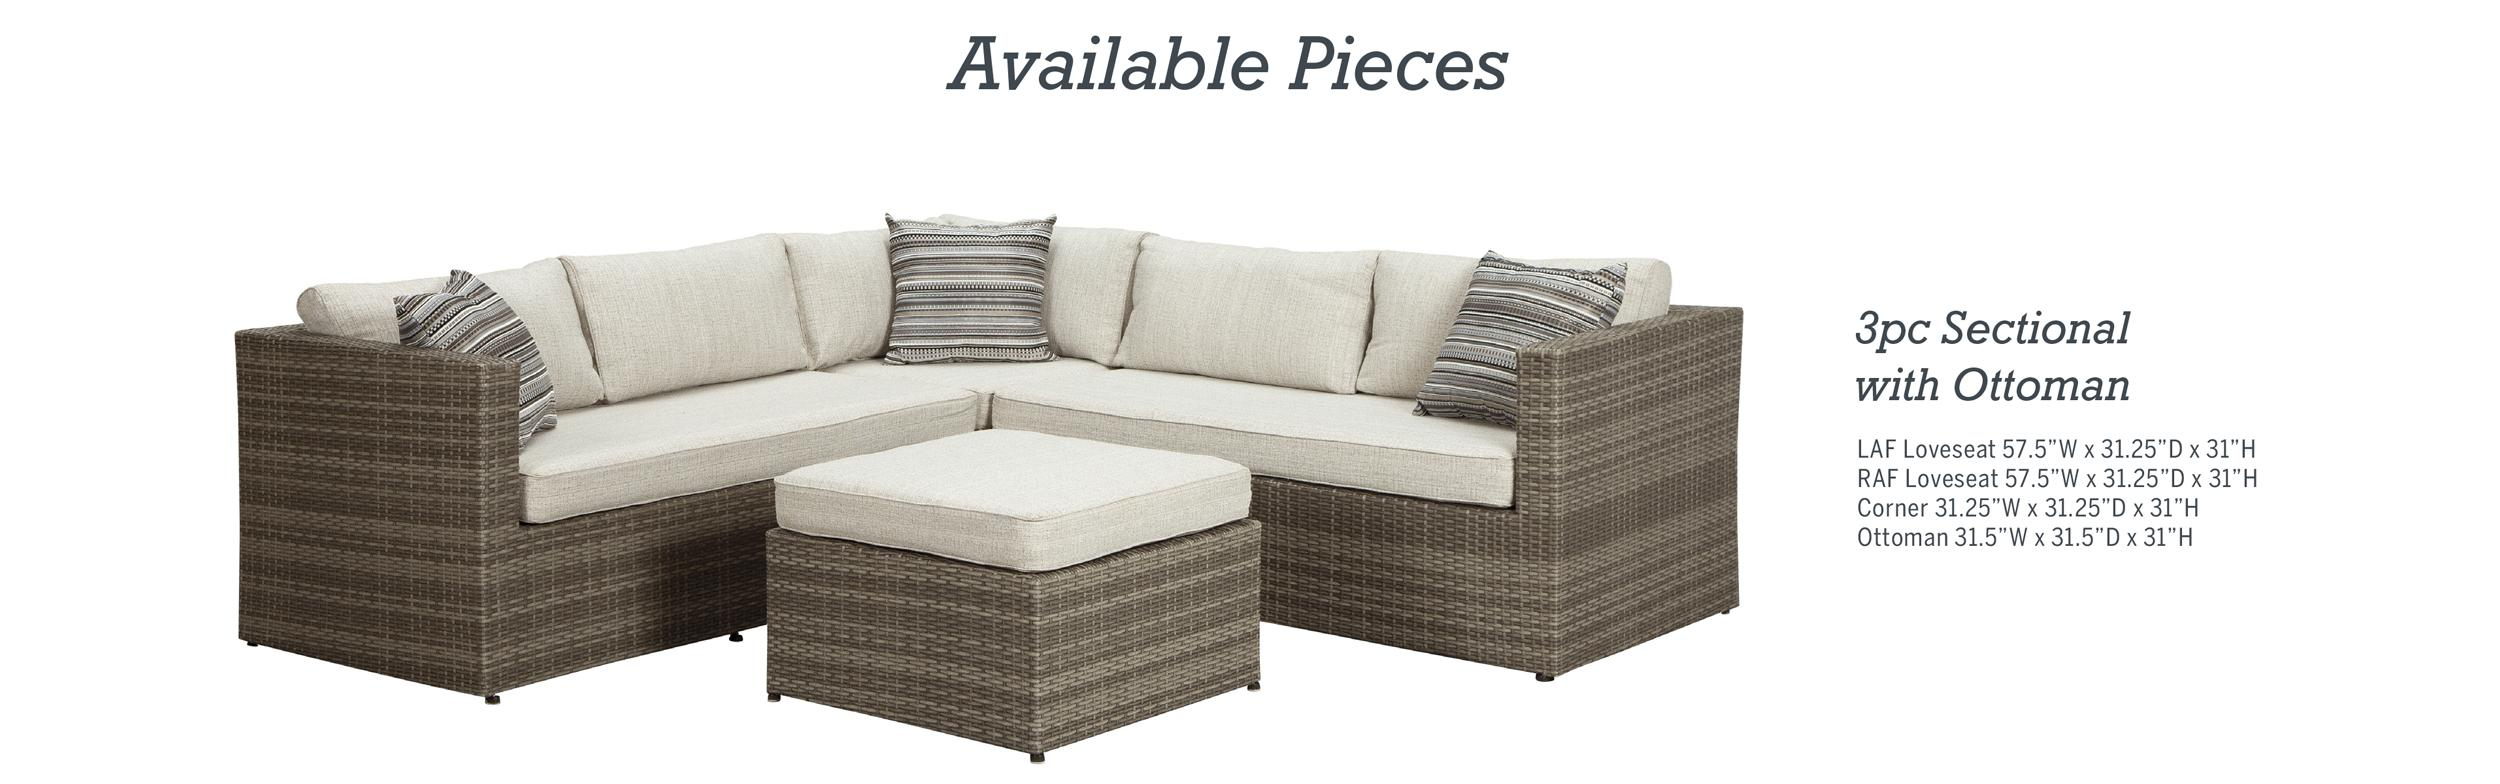 furniture corner pieces. View Larger Furniture Corner Pieces